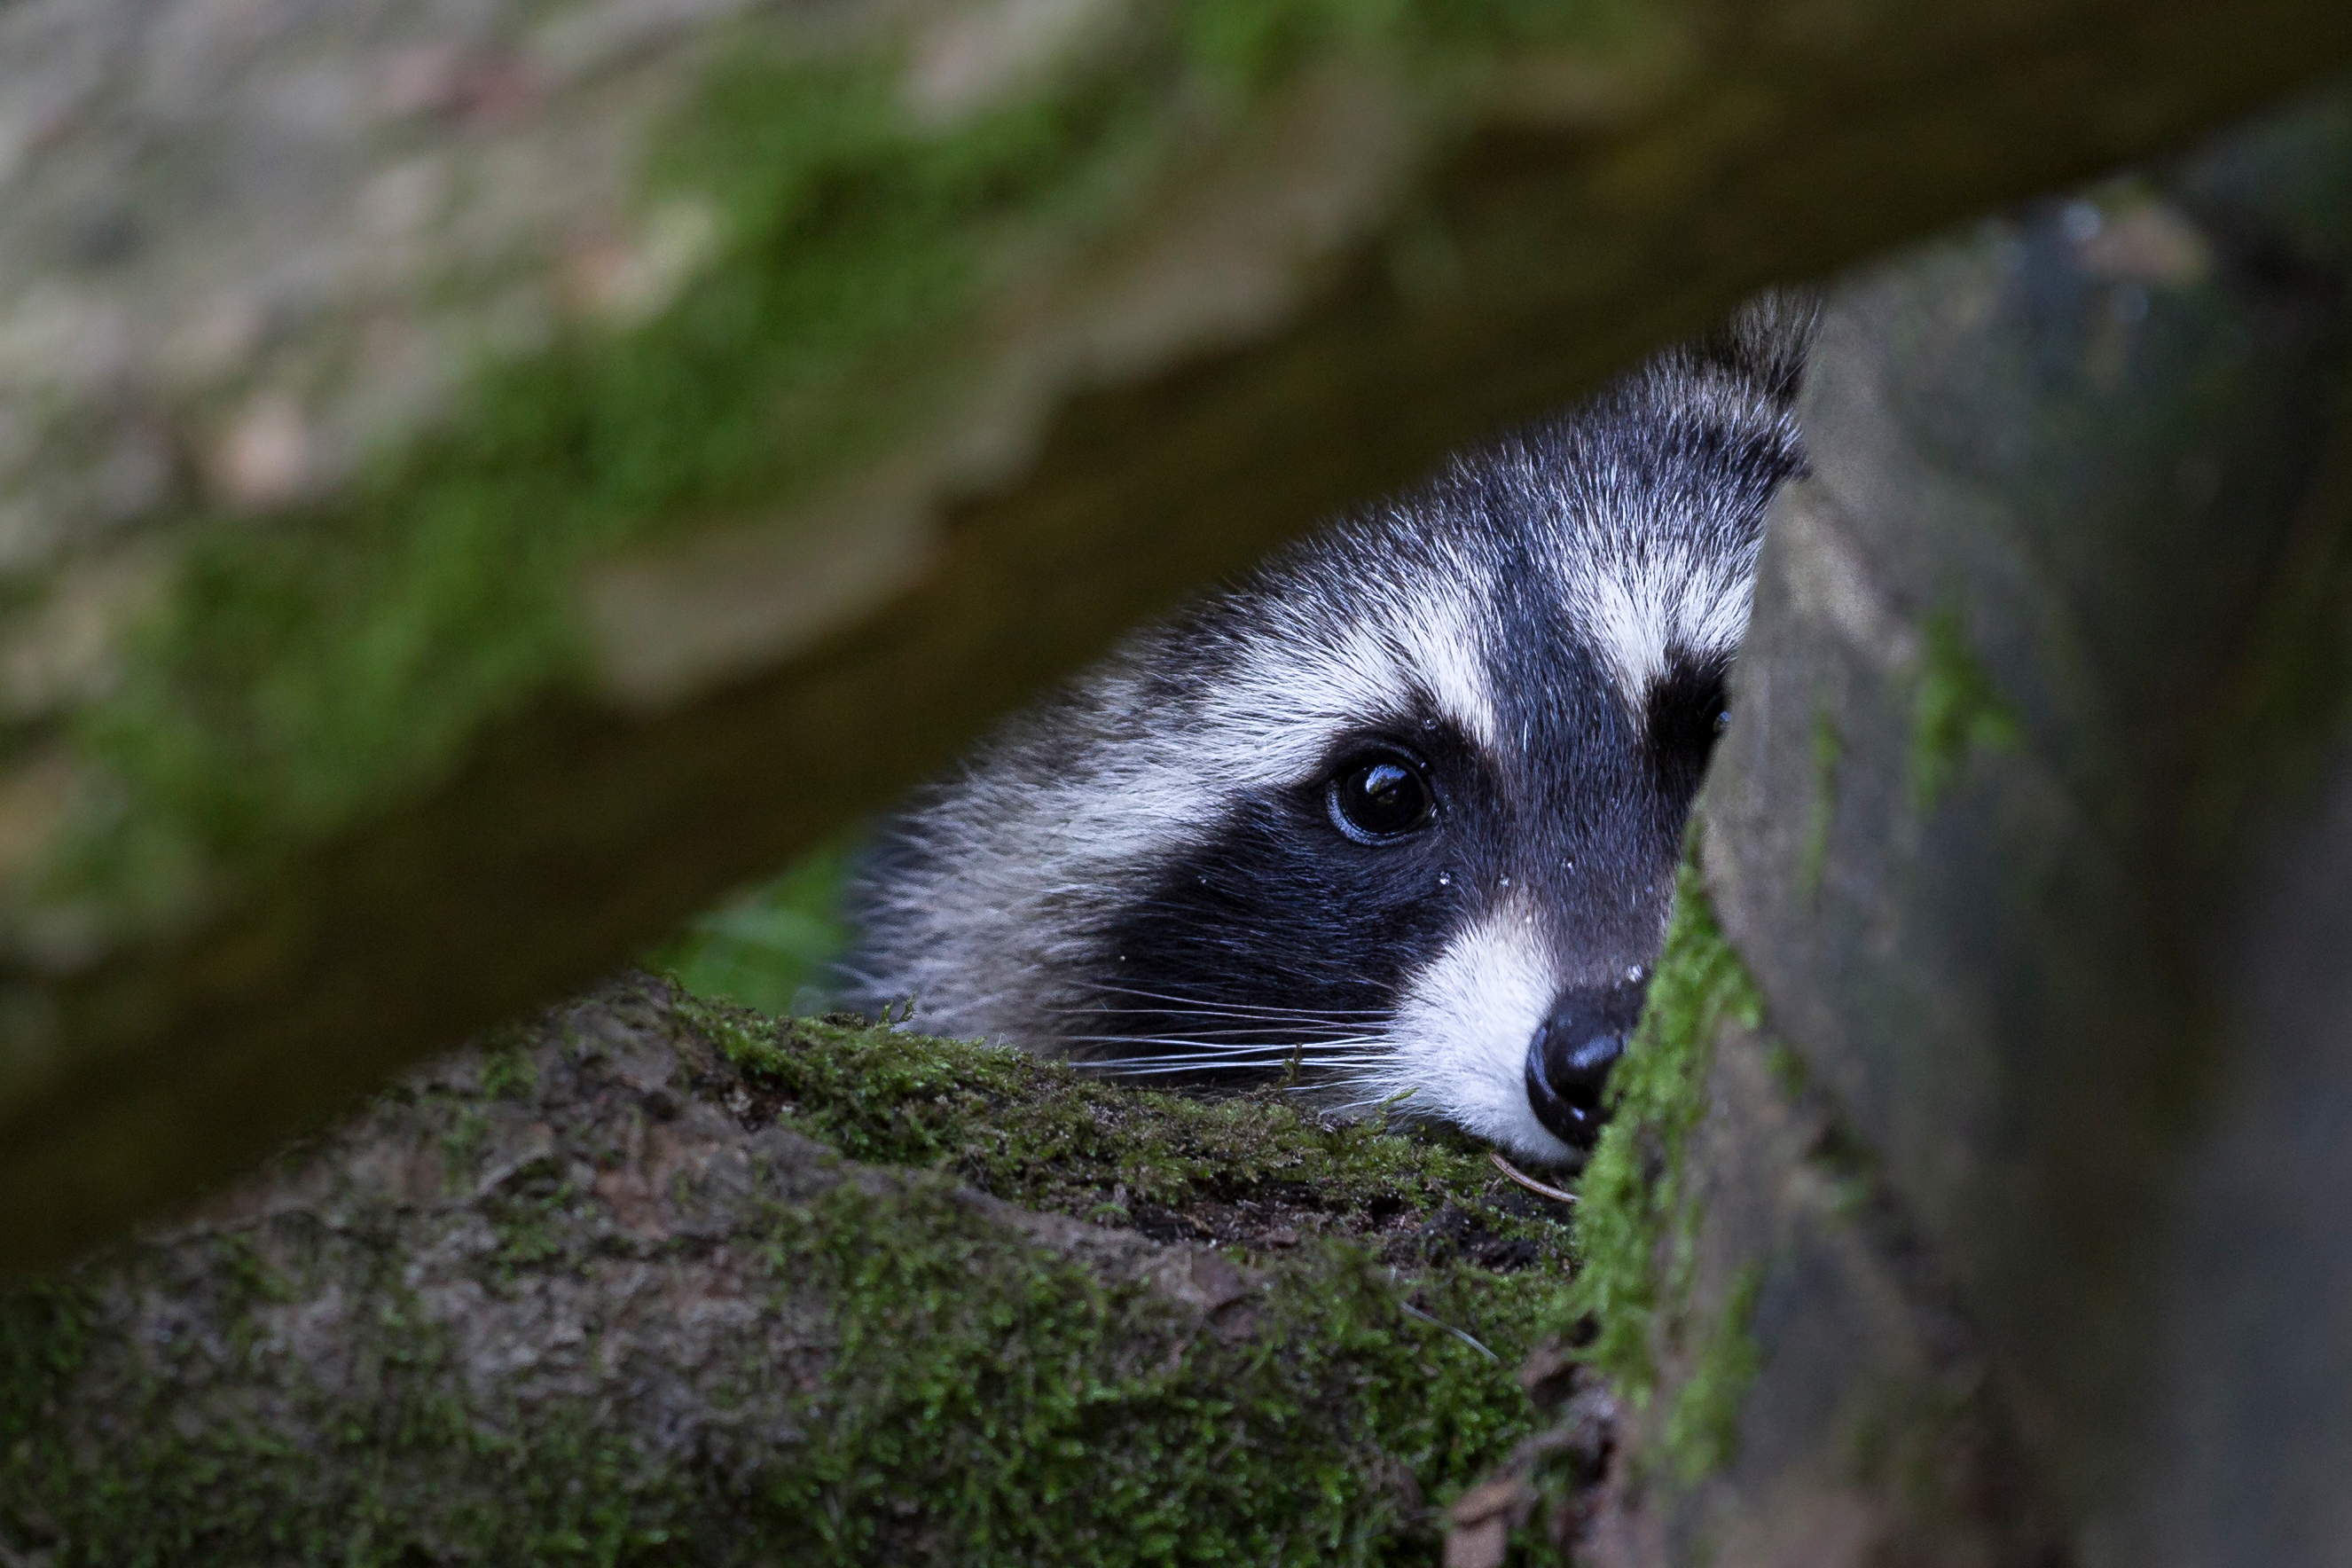 Portrait Of Raccoon Seen Through Branches